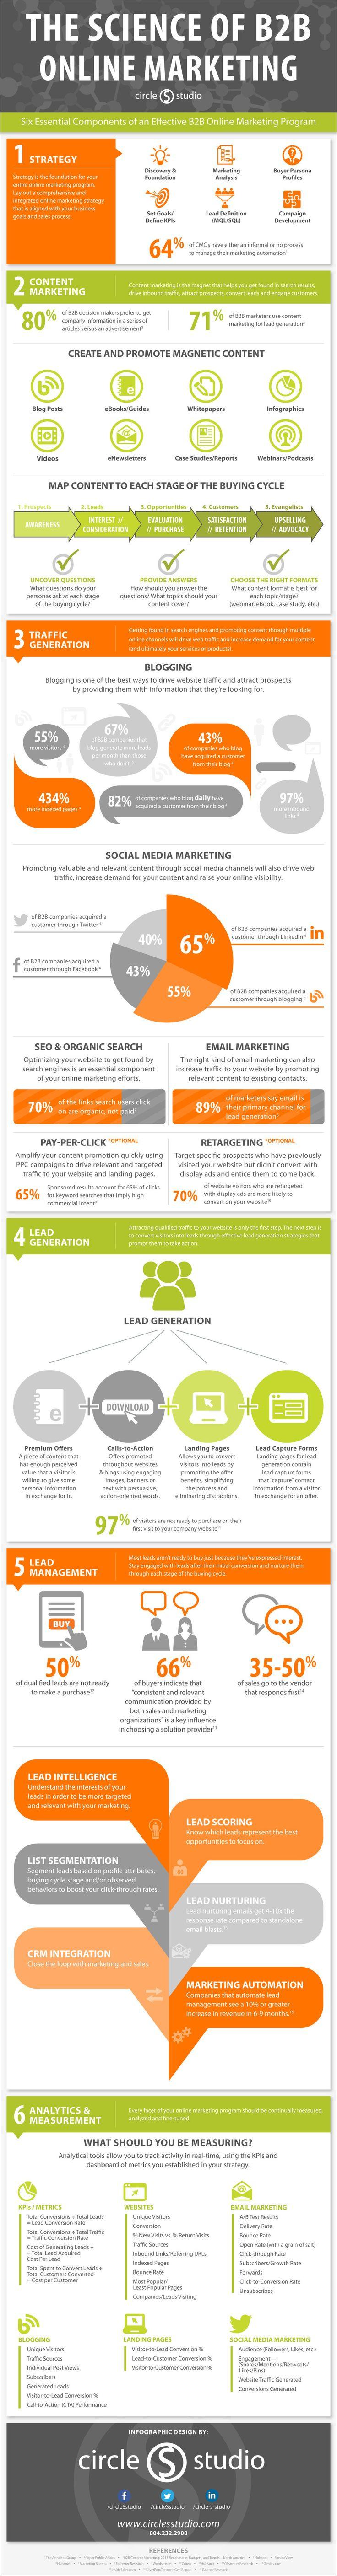 Digital-Marketing-Effective-B2B-Online-Marketing-Plan-infographic-digitalmarketing Digital Marketing : Effective B2B Online #Marketing Plan #infographic #digitalmarketing